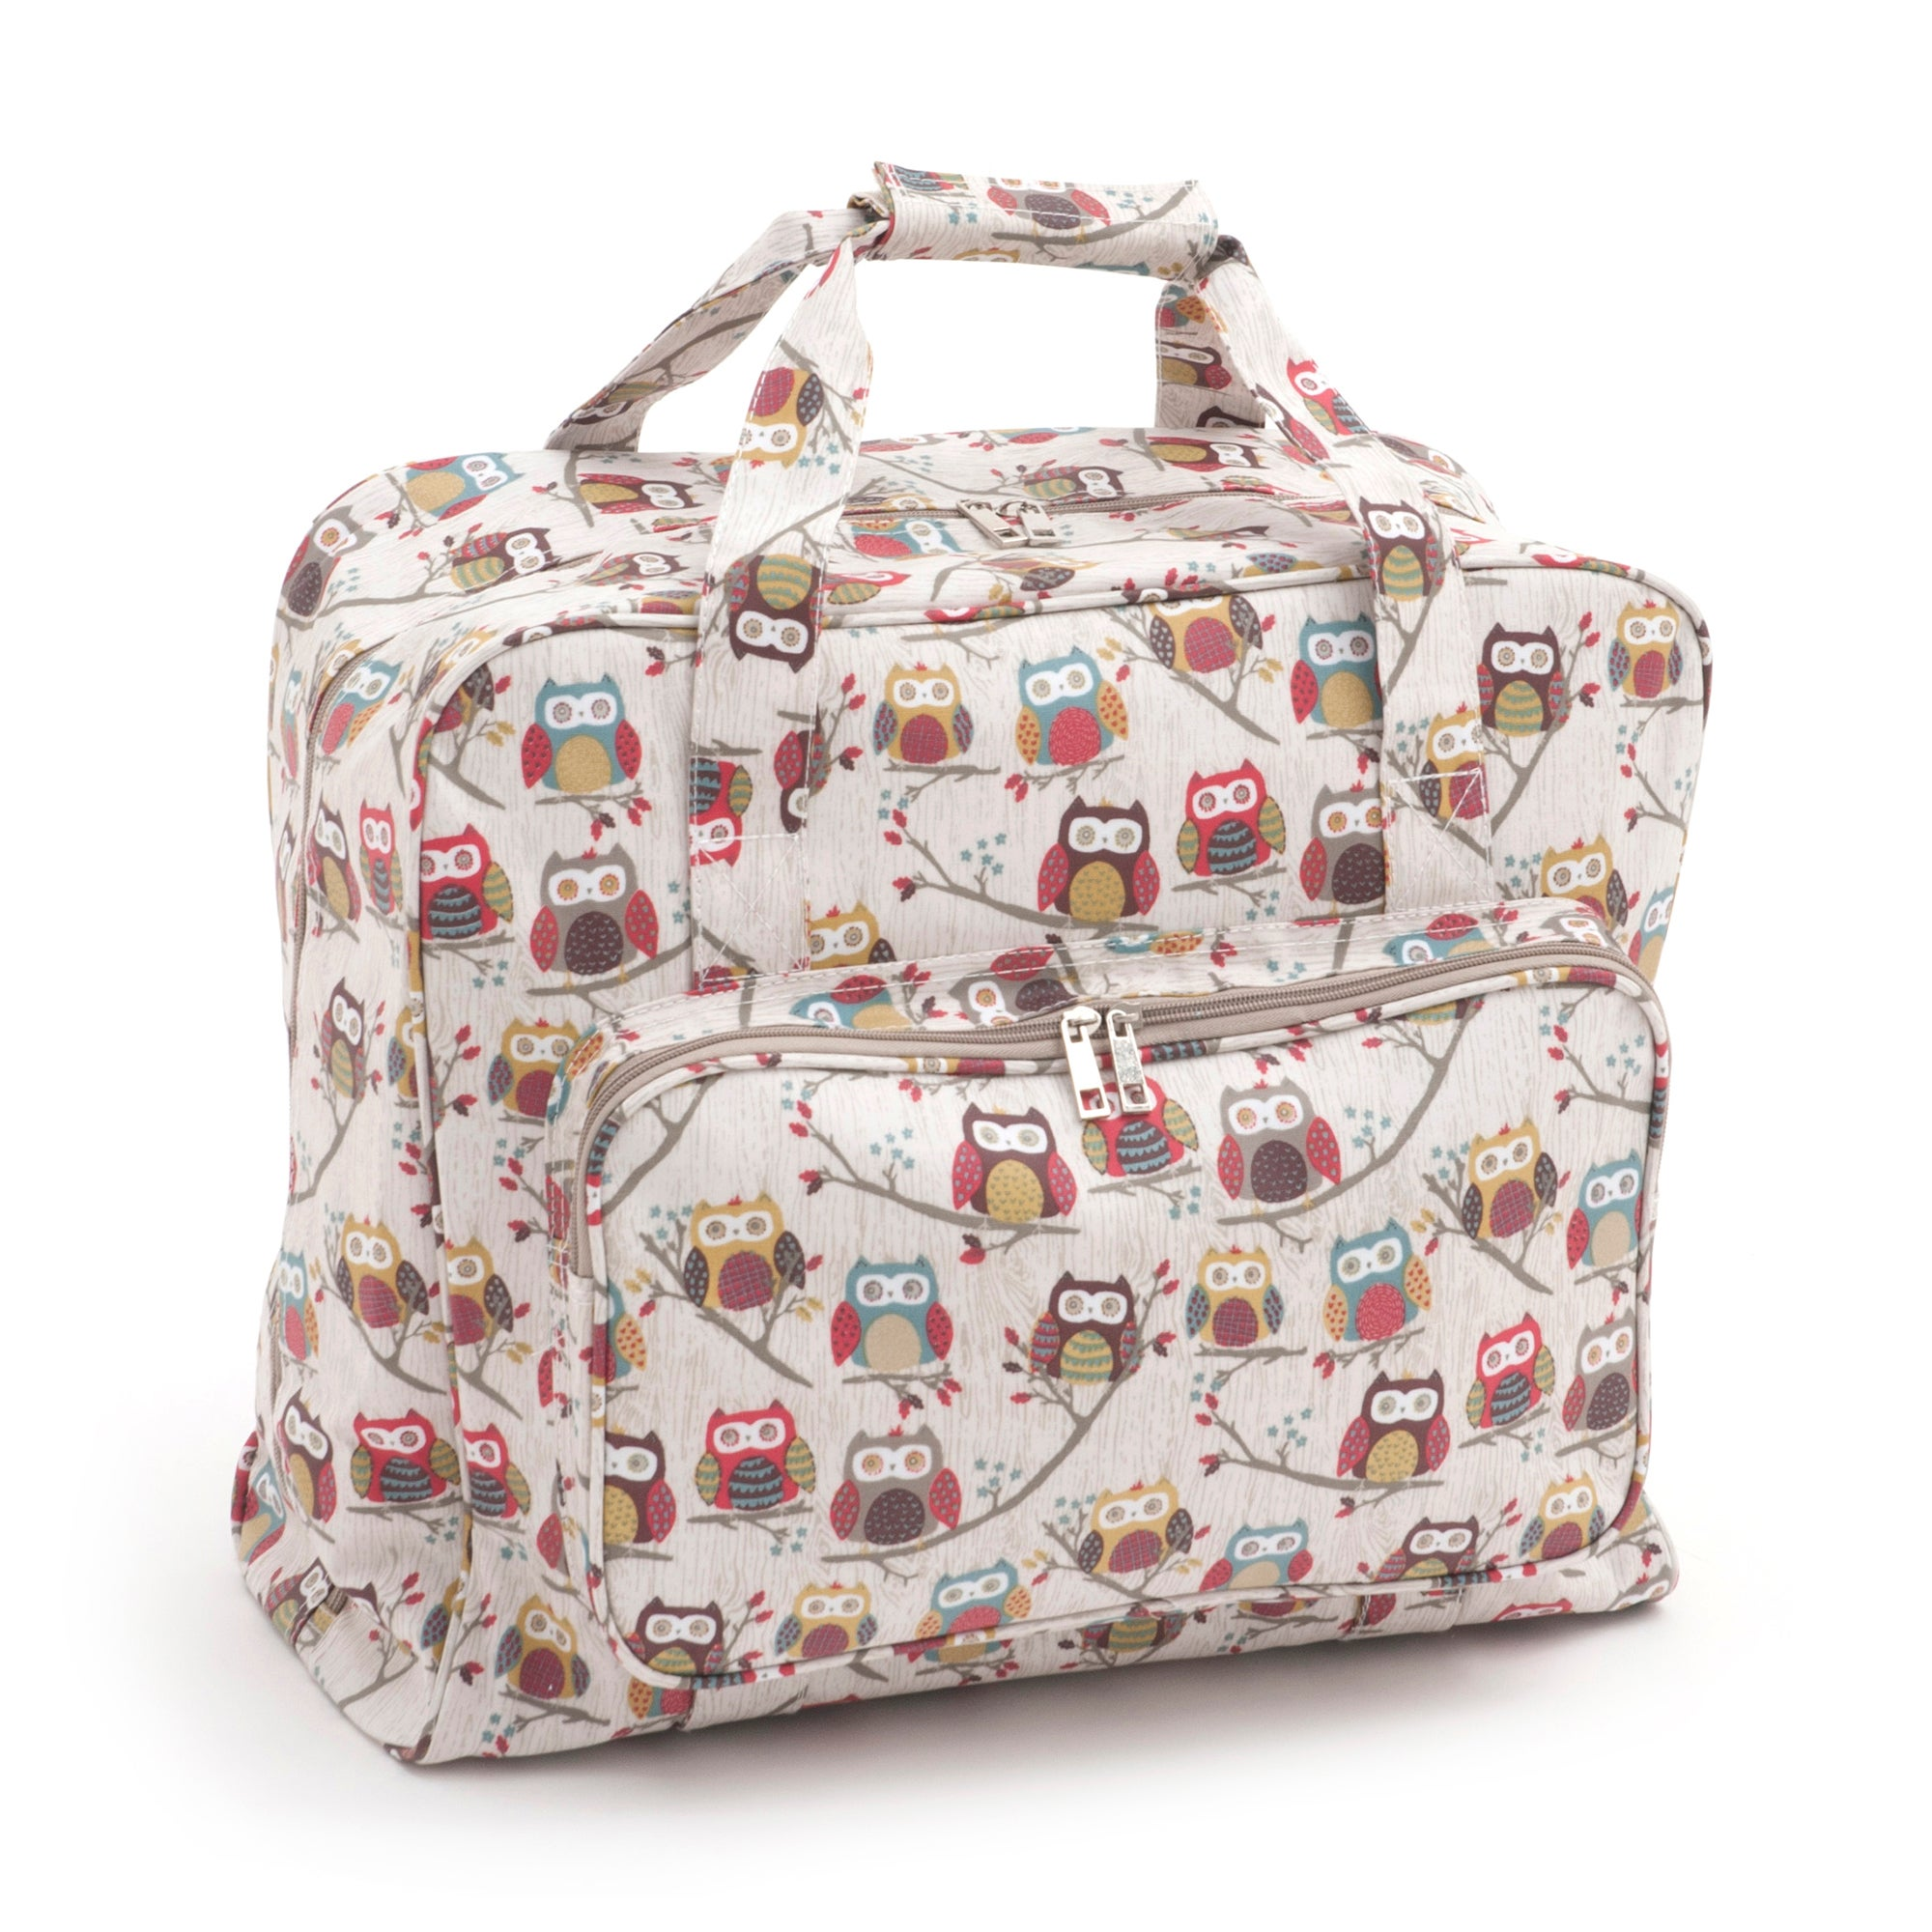 Hoot Sewing Machine Bag Pink/Yellow/Red